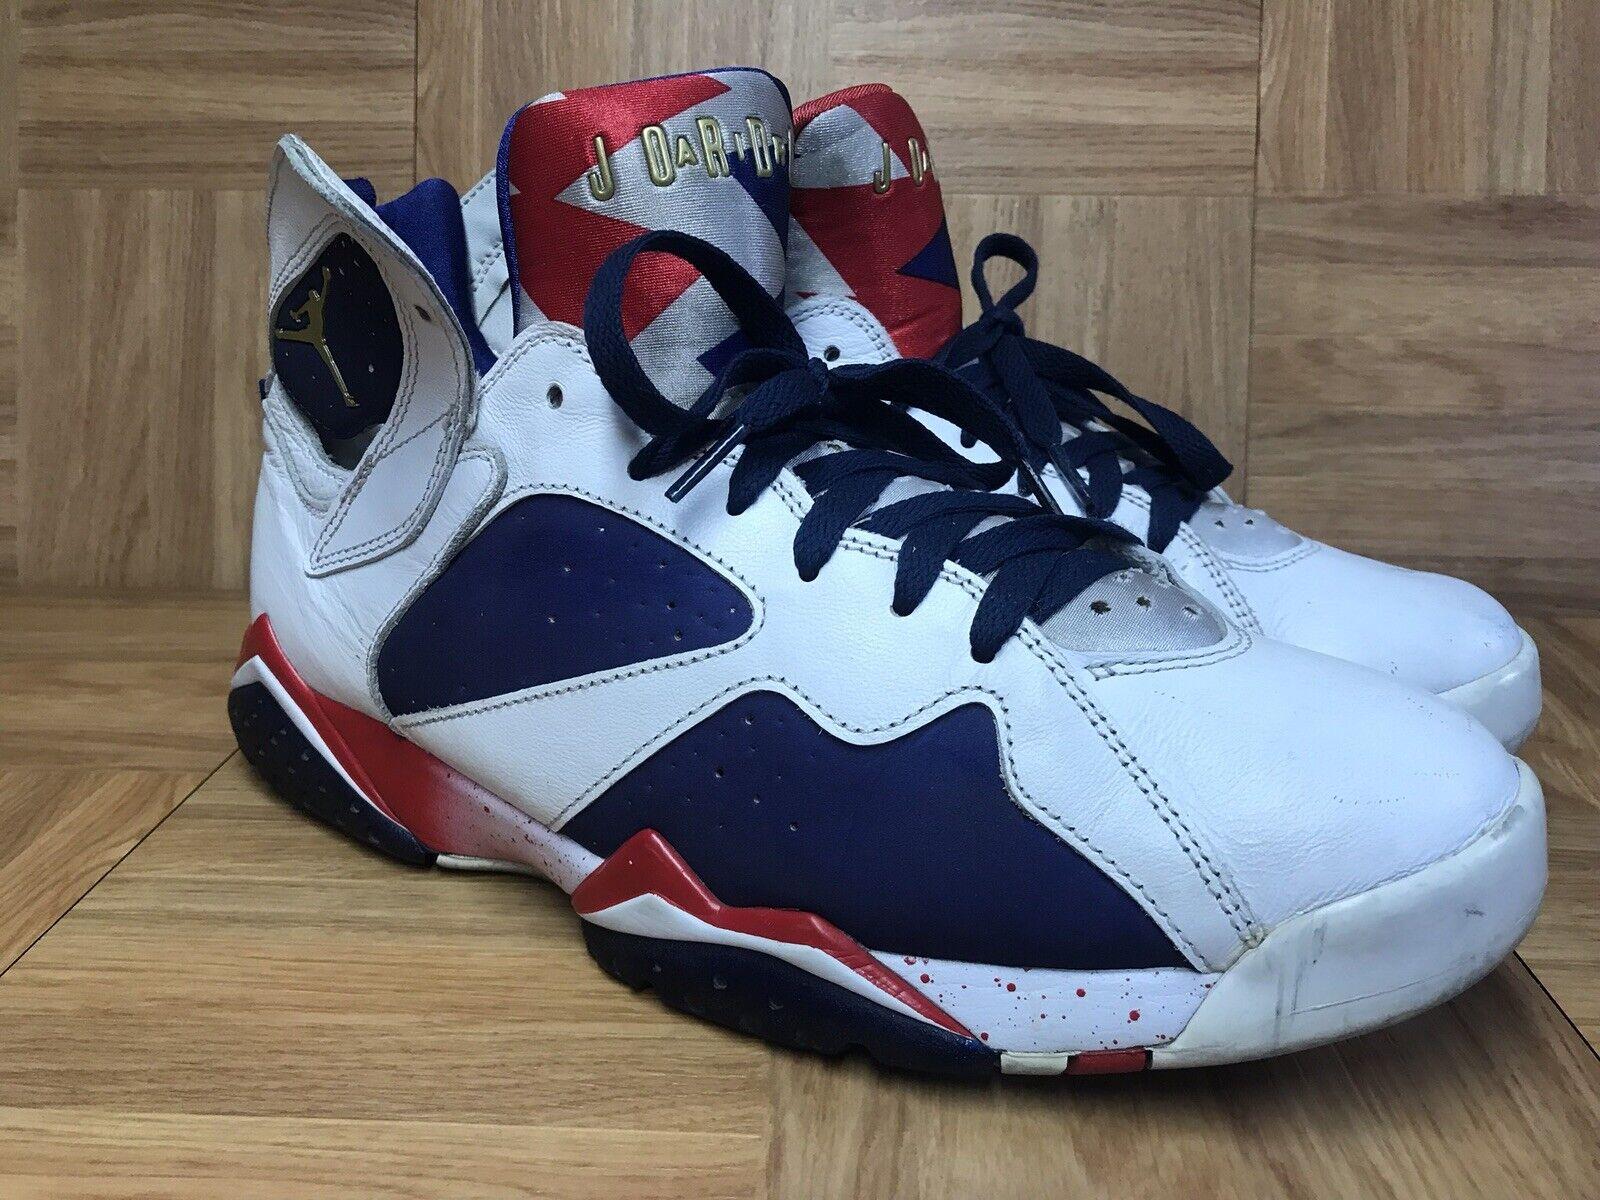 4aa53a5cbf7 RARE Nike Air Retro 7 VII Alternate Olympic gold S 11 304775-123 Tinker  Jordan ntkwqs3879-Athletic Shoes